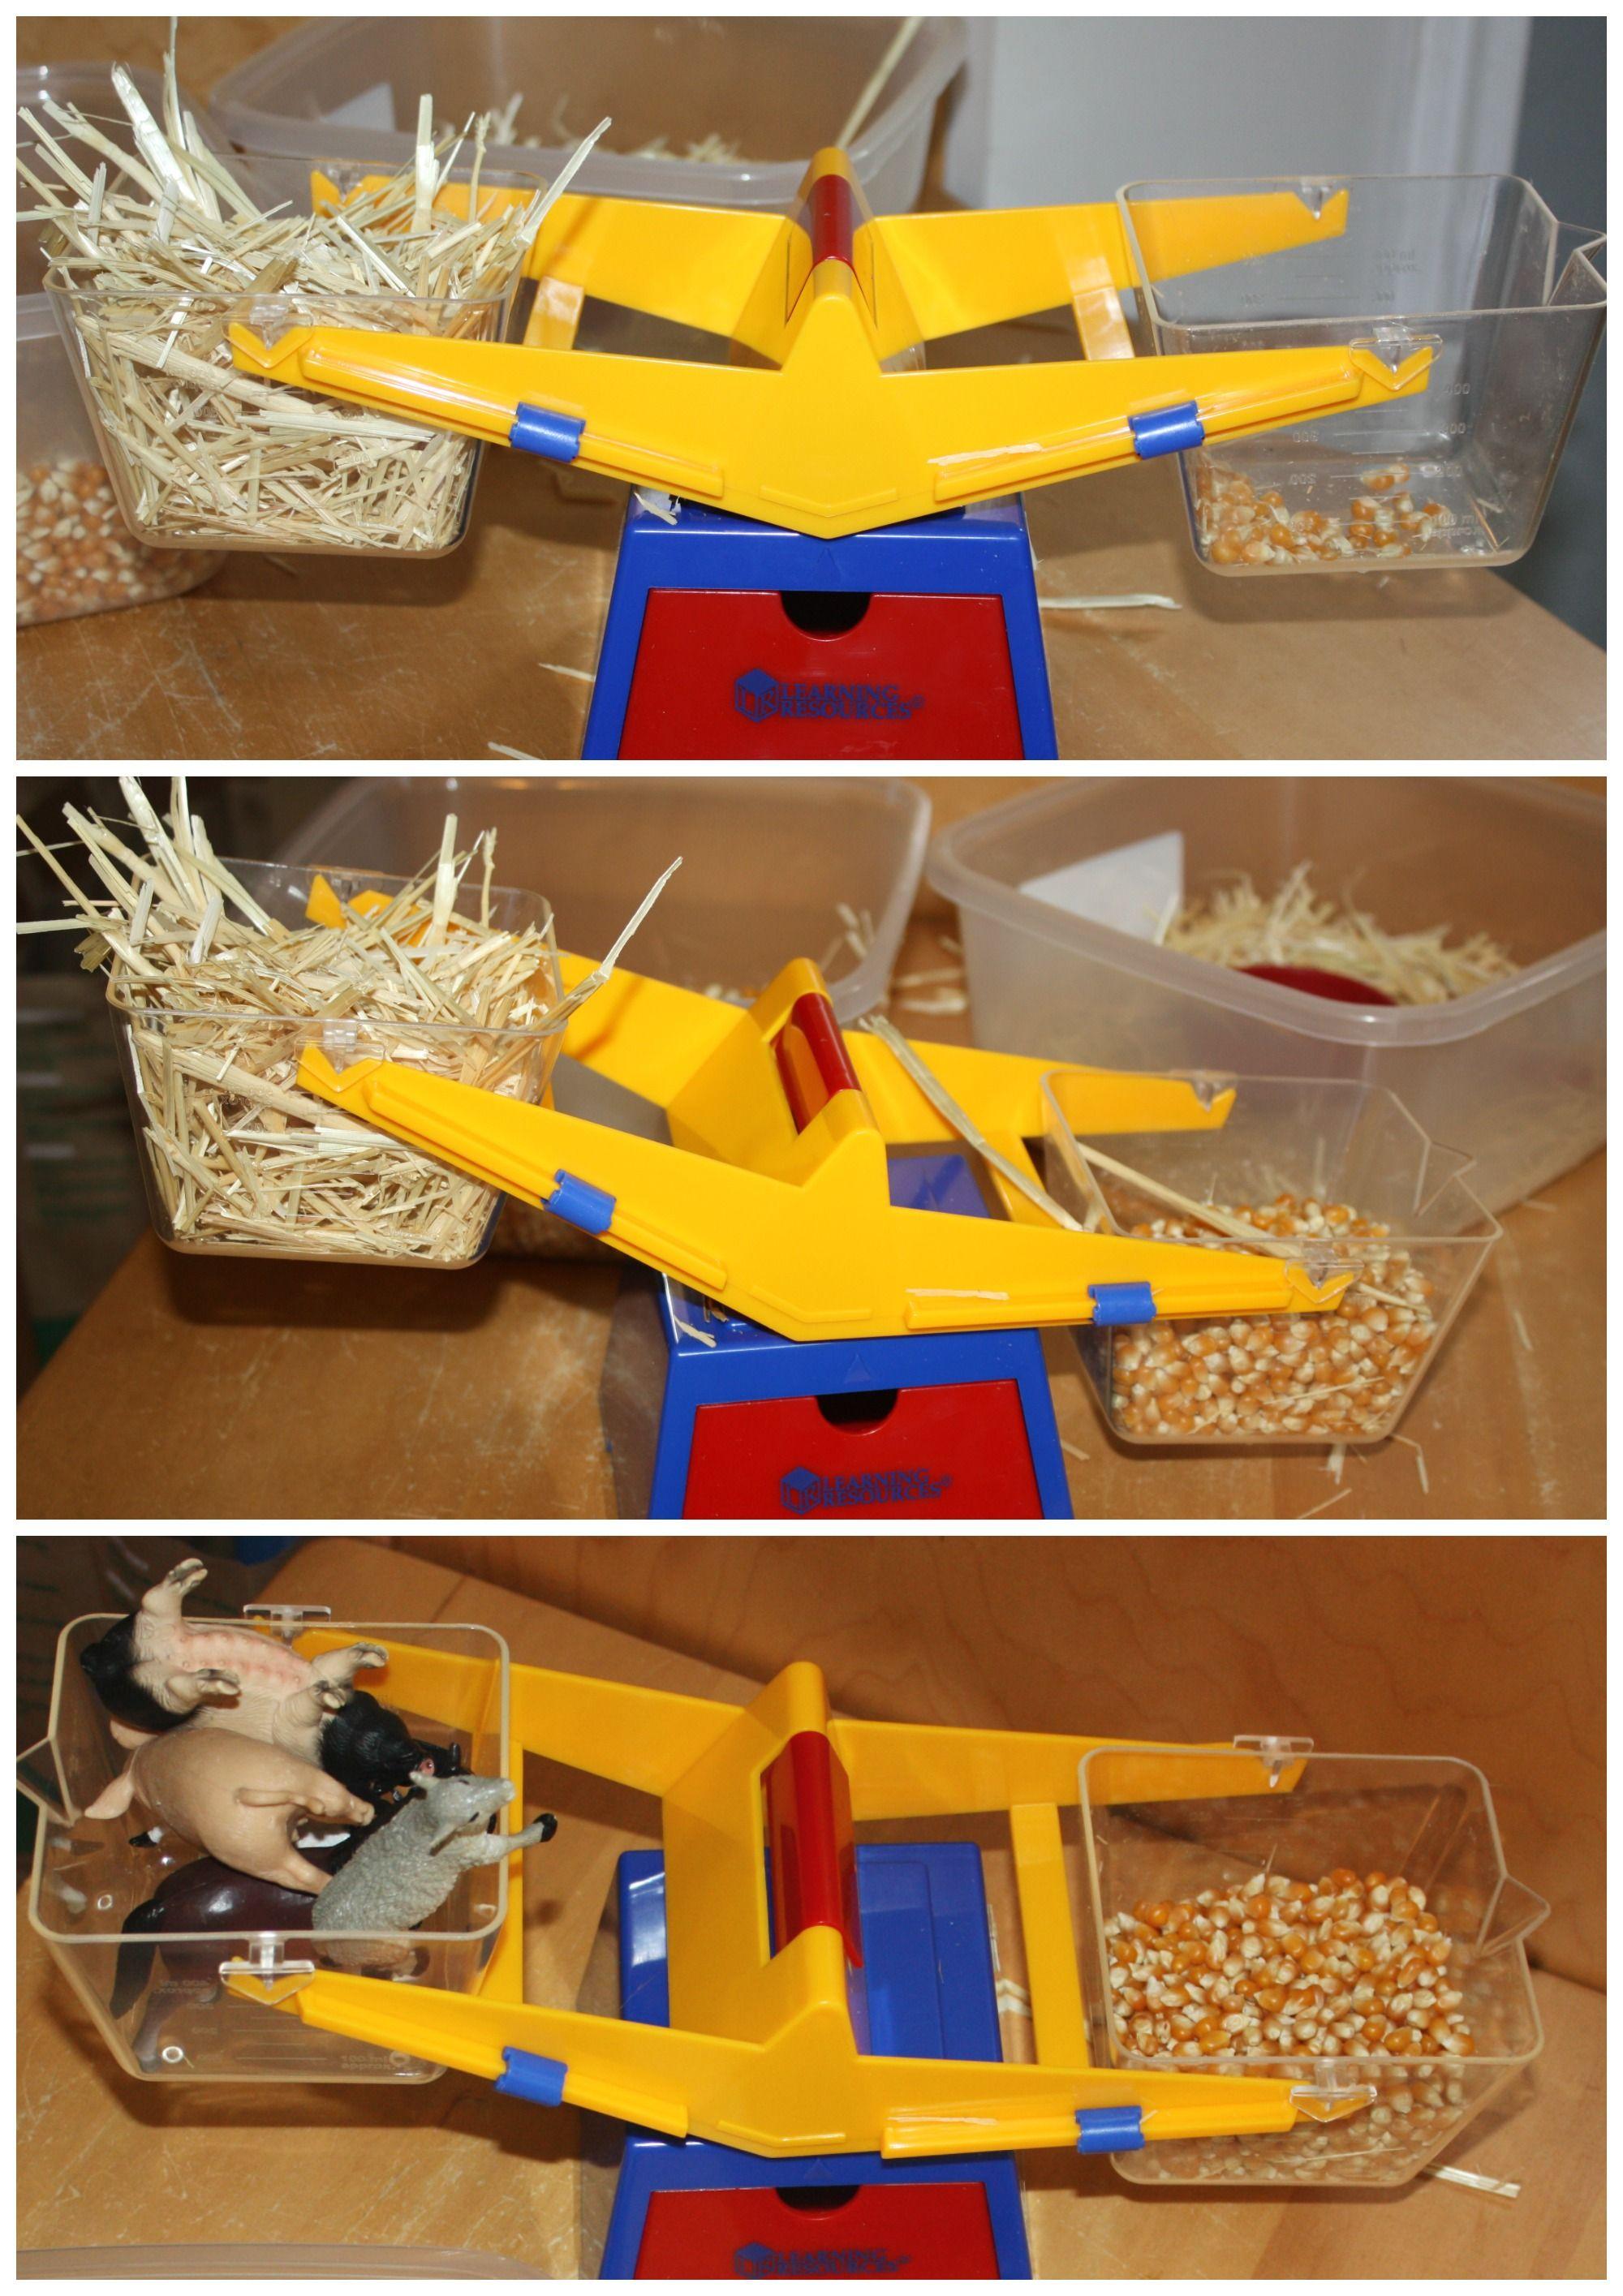 Preschool Farm Activities And Sensory Play Ideas For Math Science